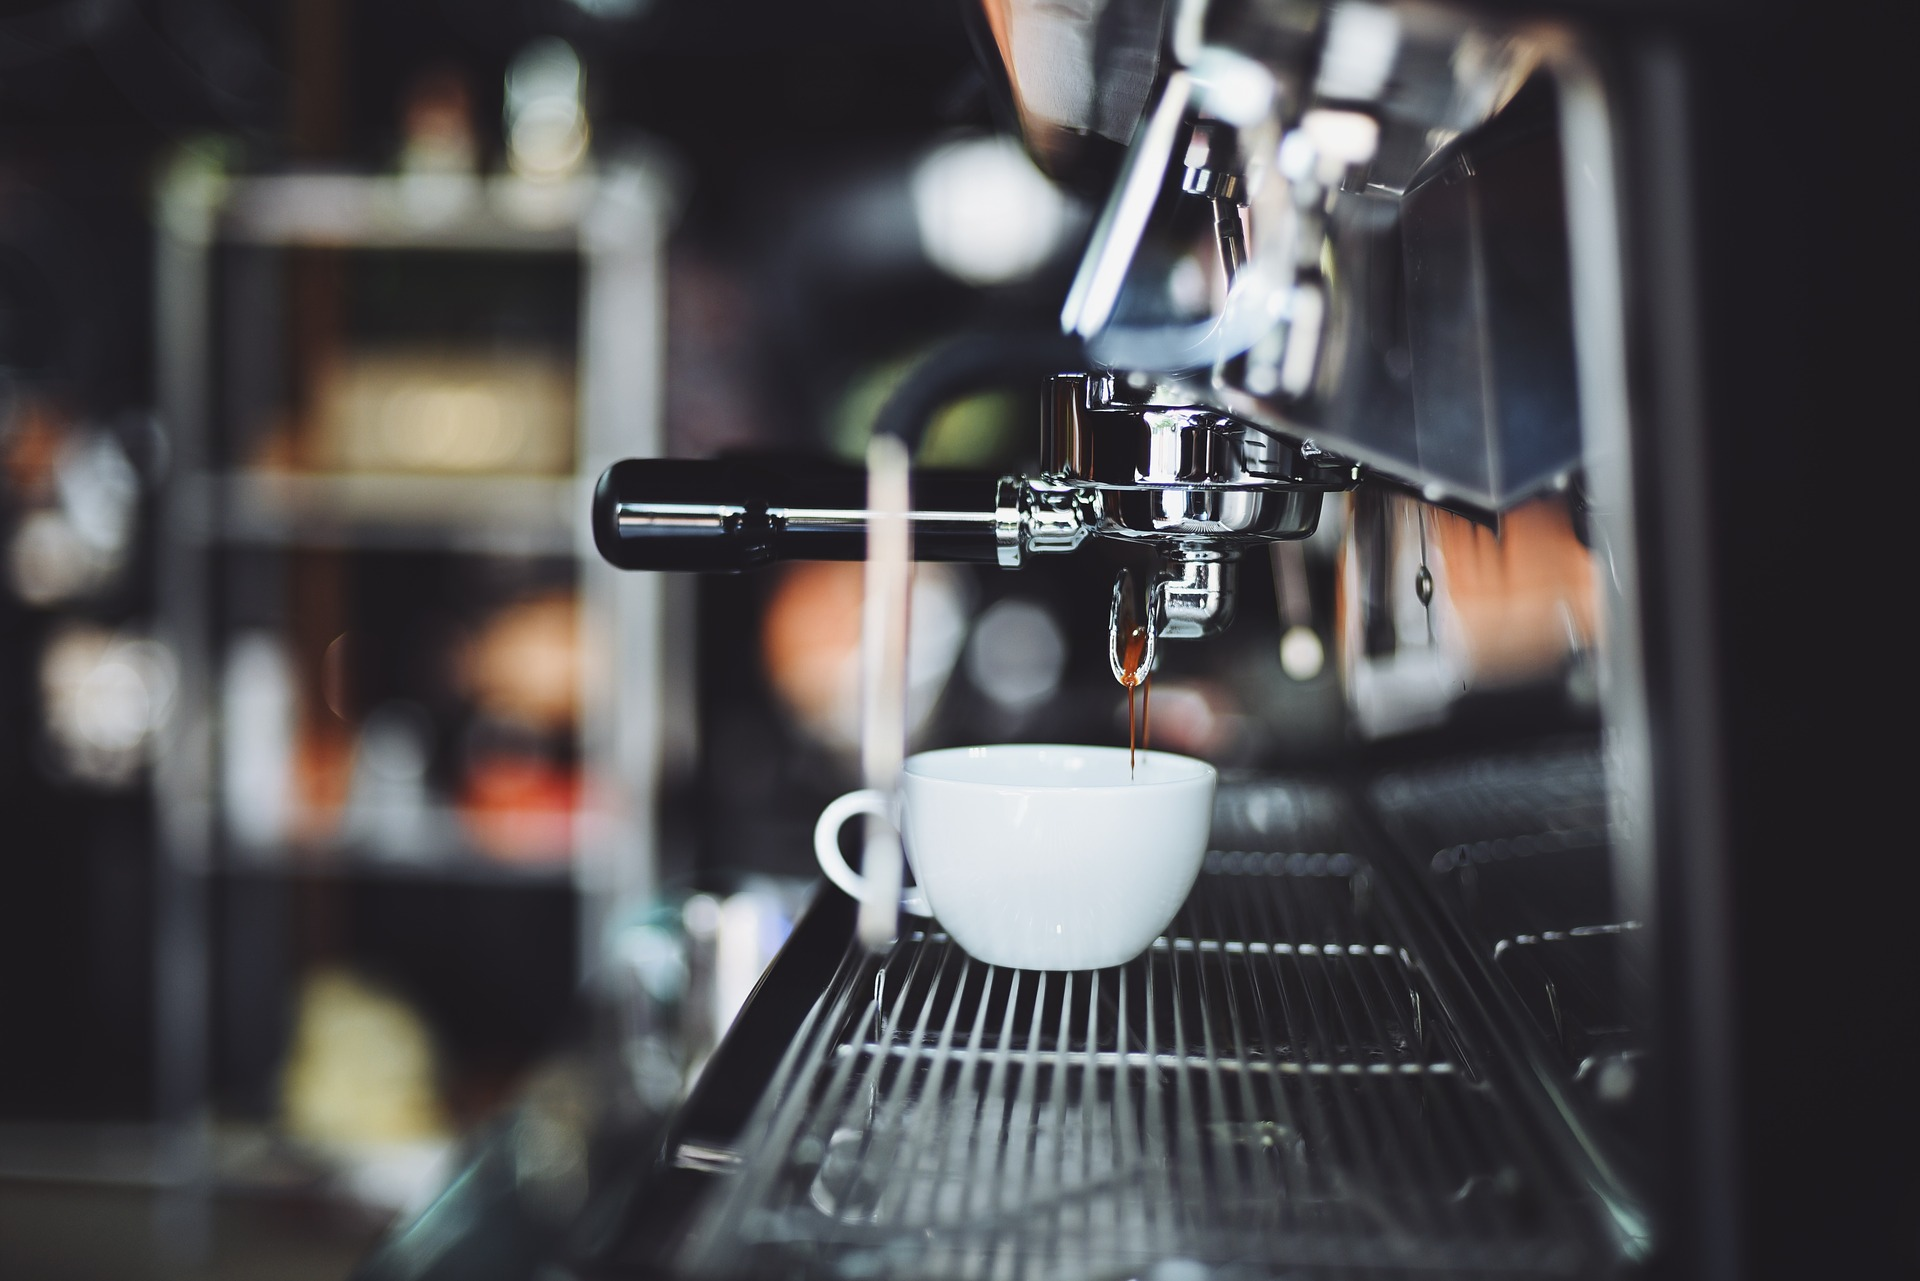 Espresso drips into a coffee mug in a cafe